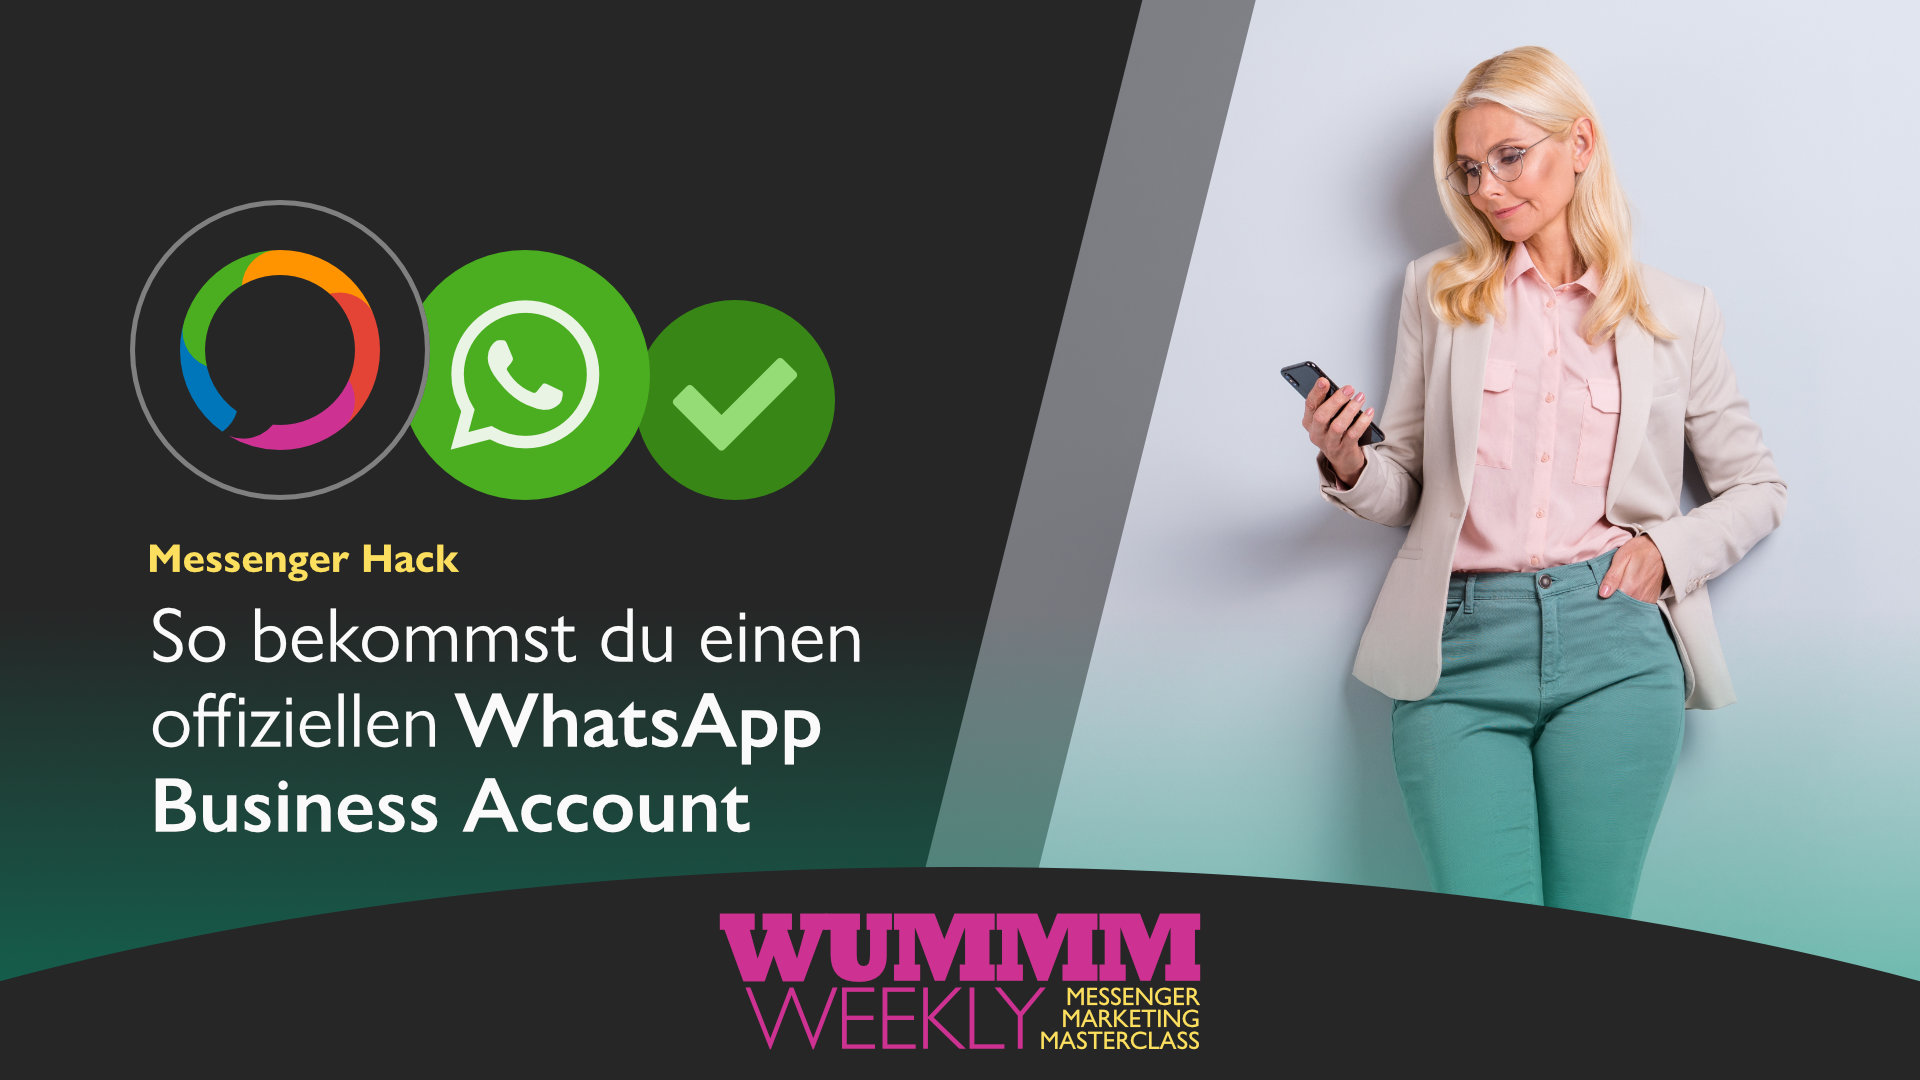 Wummm-weekl, MP Logo, WhatsApp Logo, WhatsApp Business Account